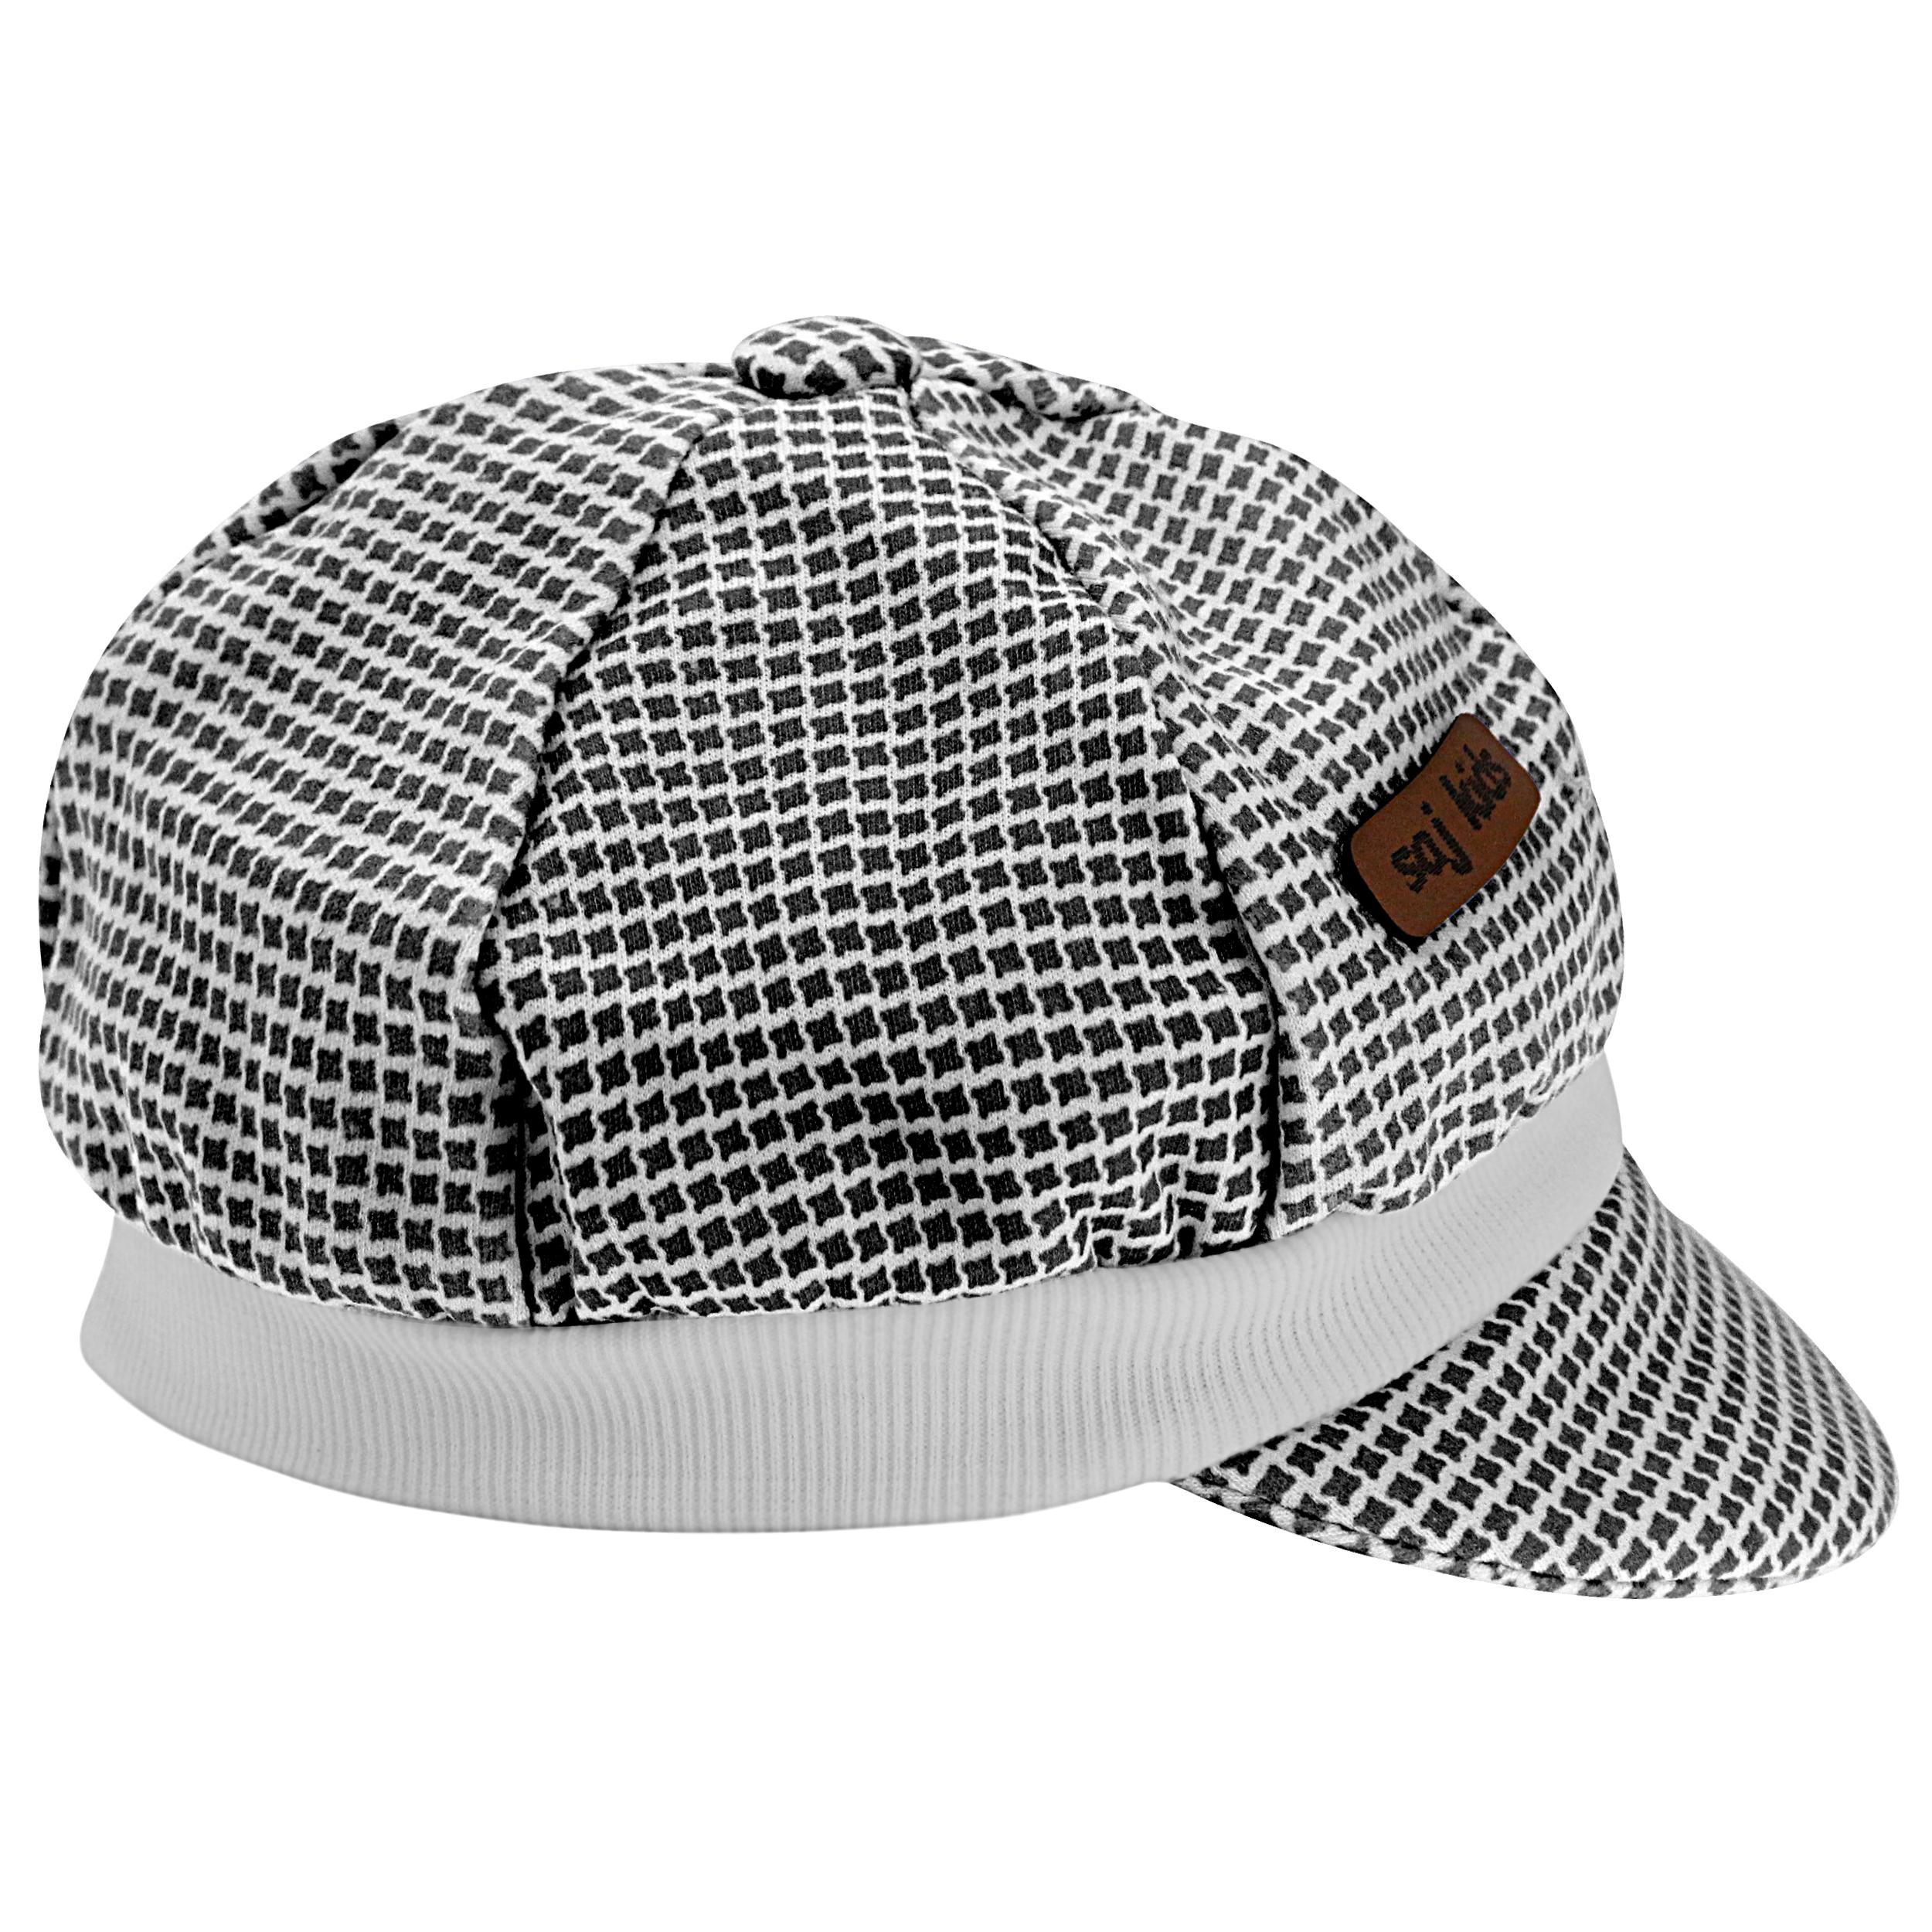 کلاه نوزادی پسرانه مدل y150